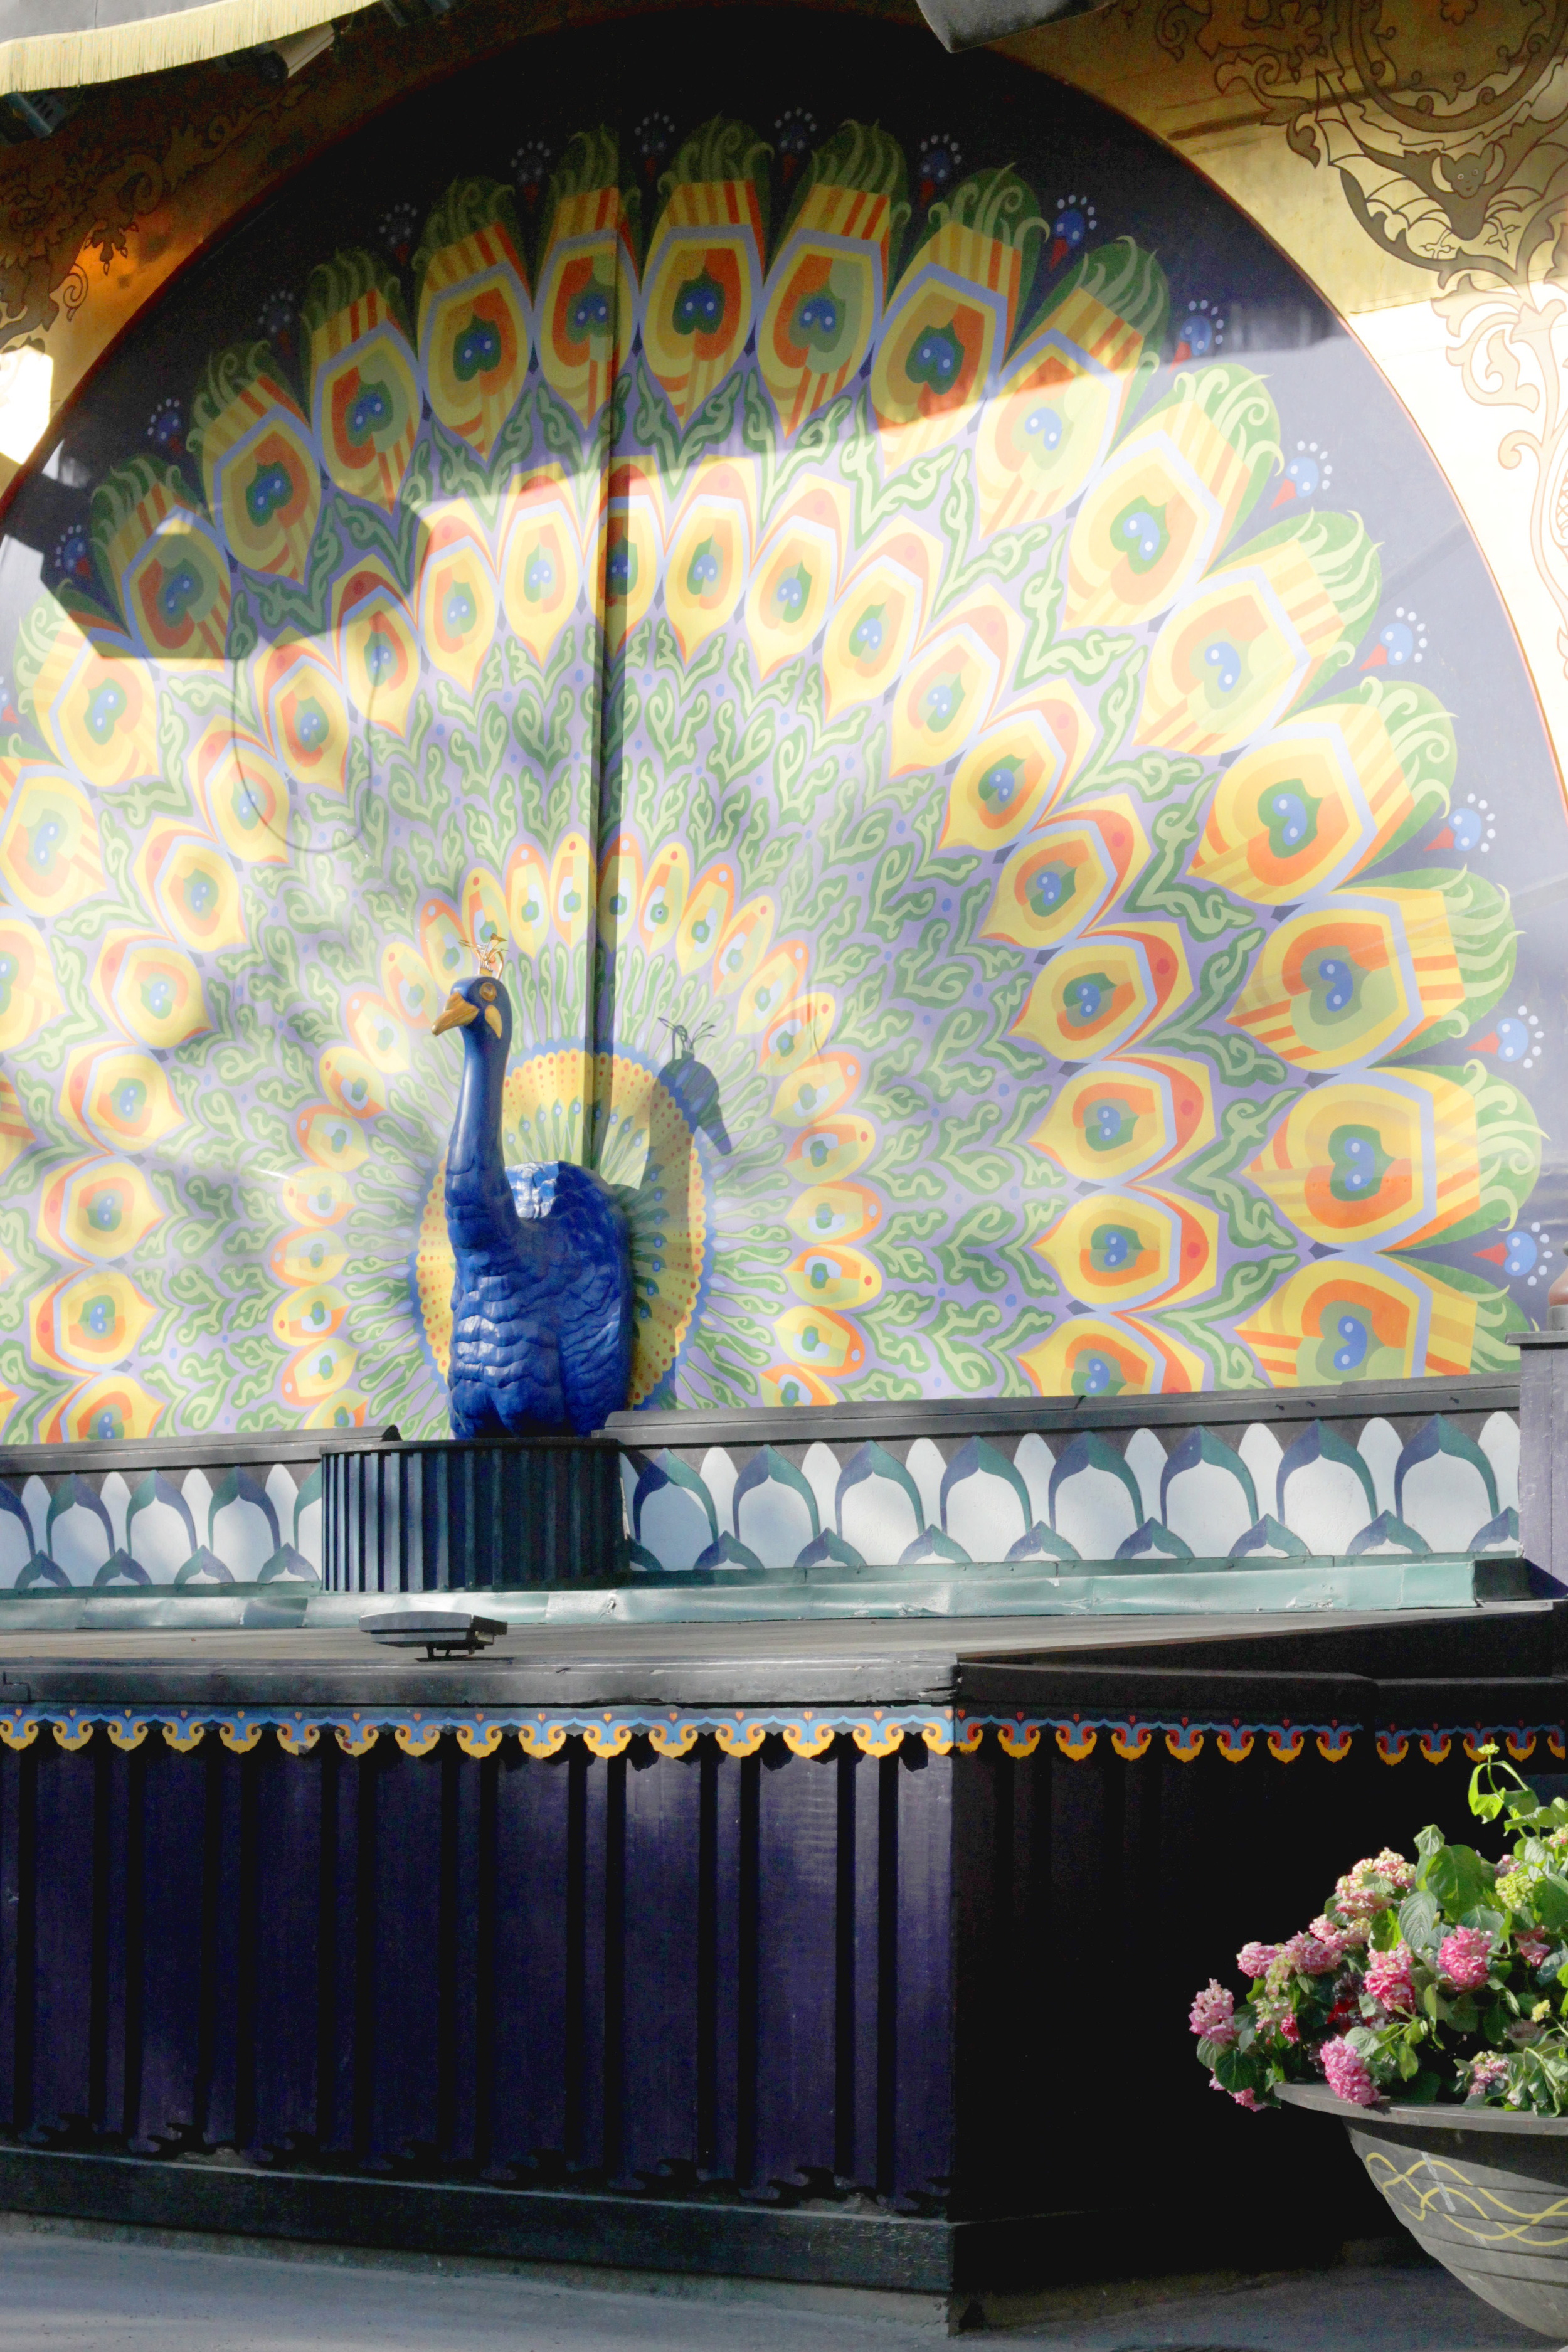 pantomime theatre, tivoli gardens, copenhagen | via: bekuh b.